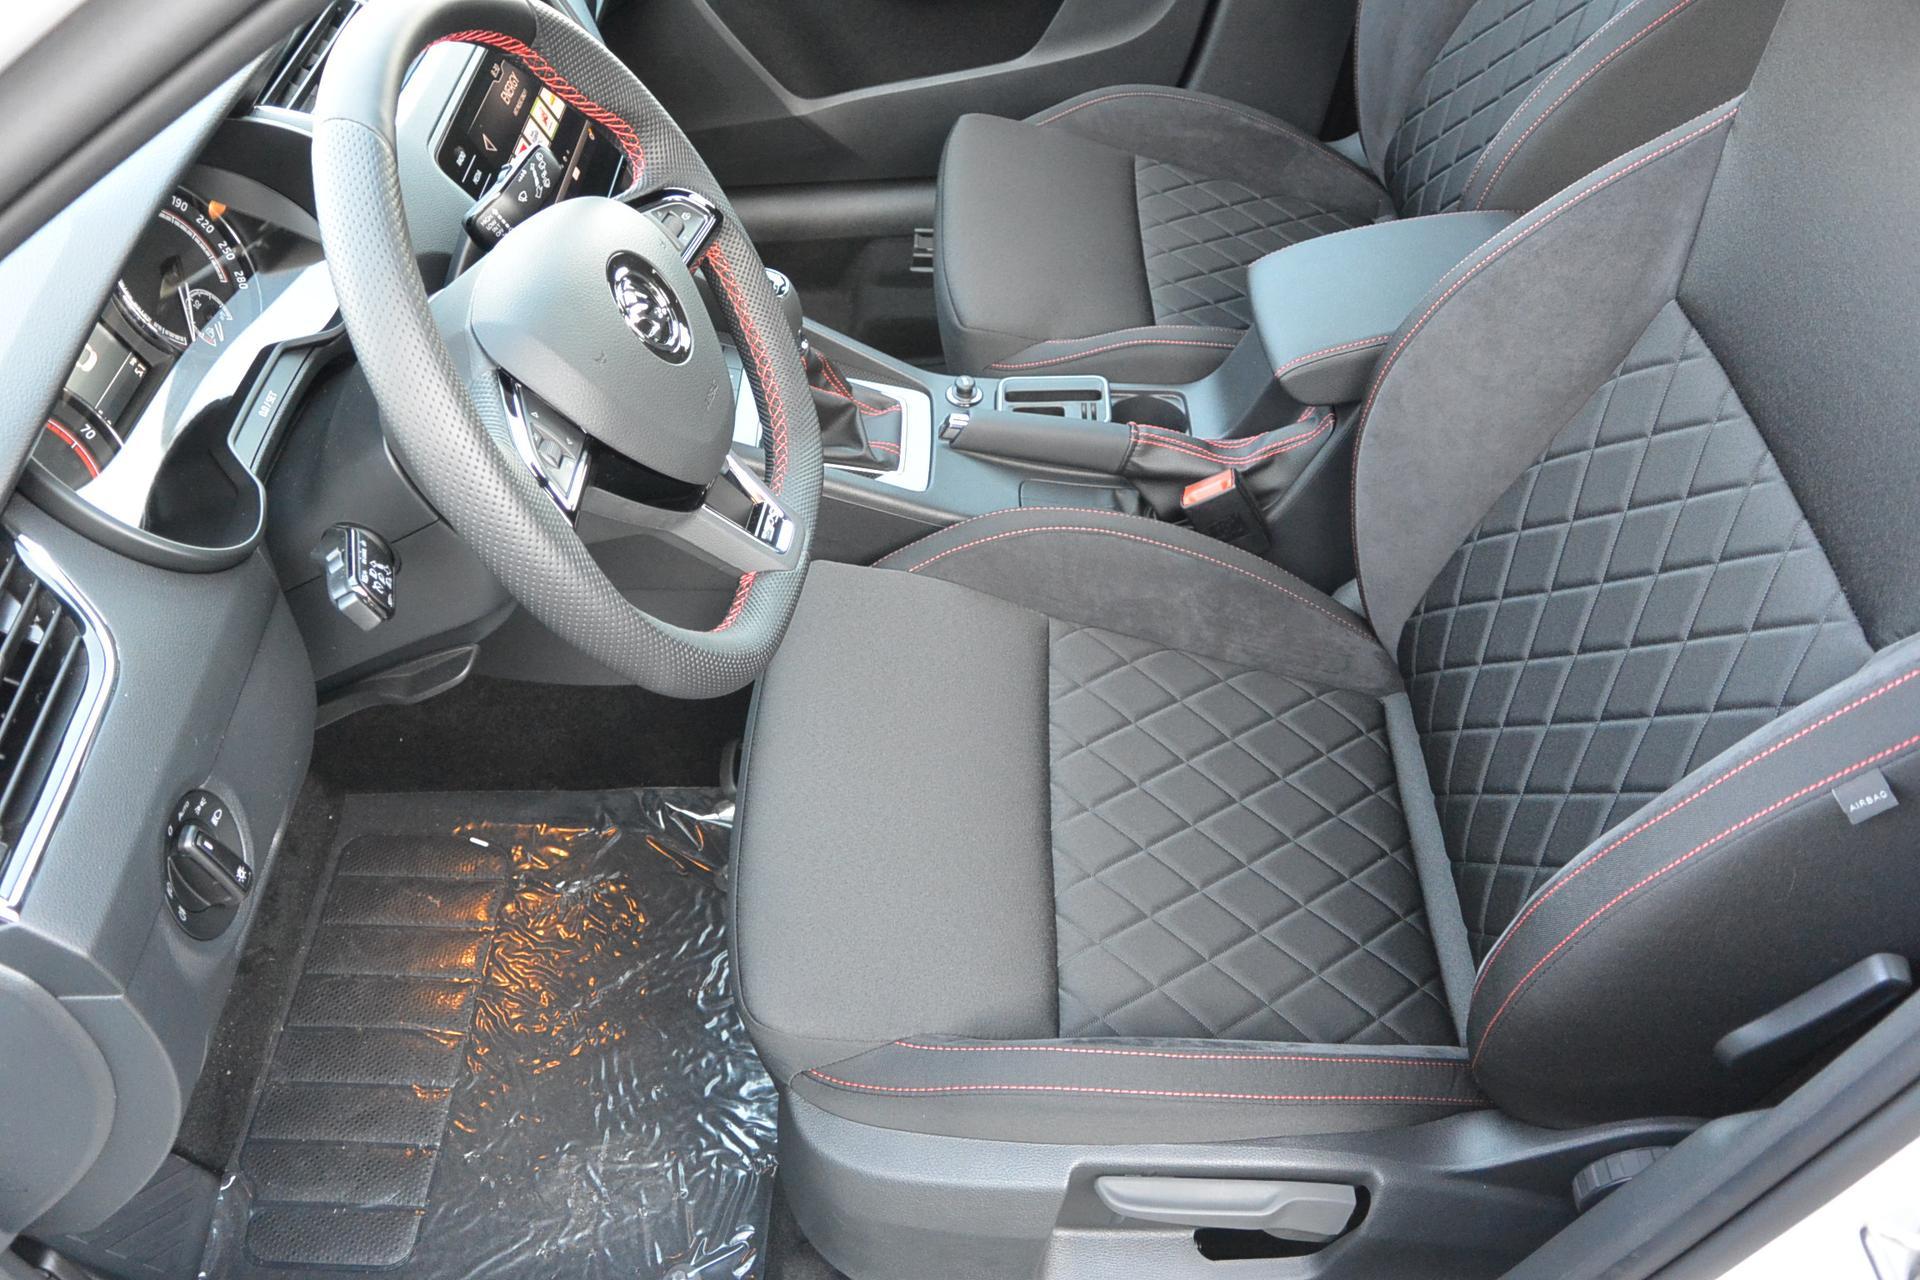 Skoda Octavia RS bi 2 0 TSI DSG 180 kW 245 PS Automatik 7 Gang